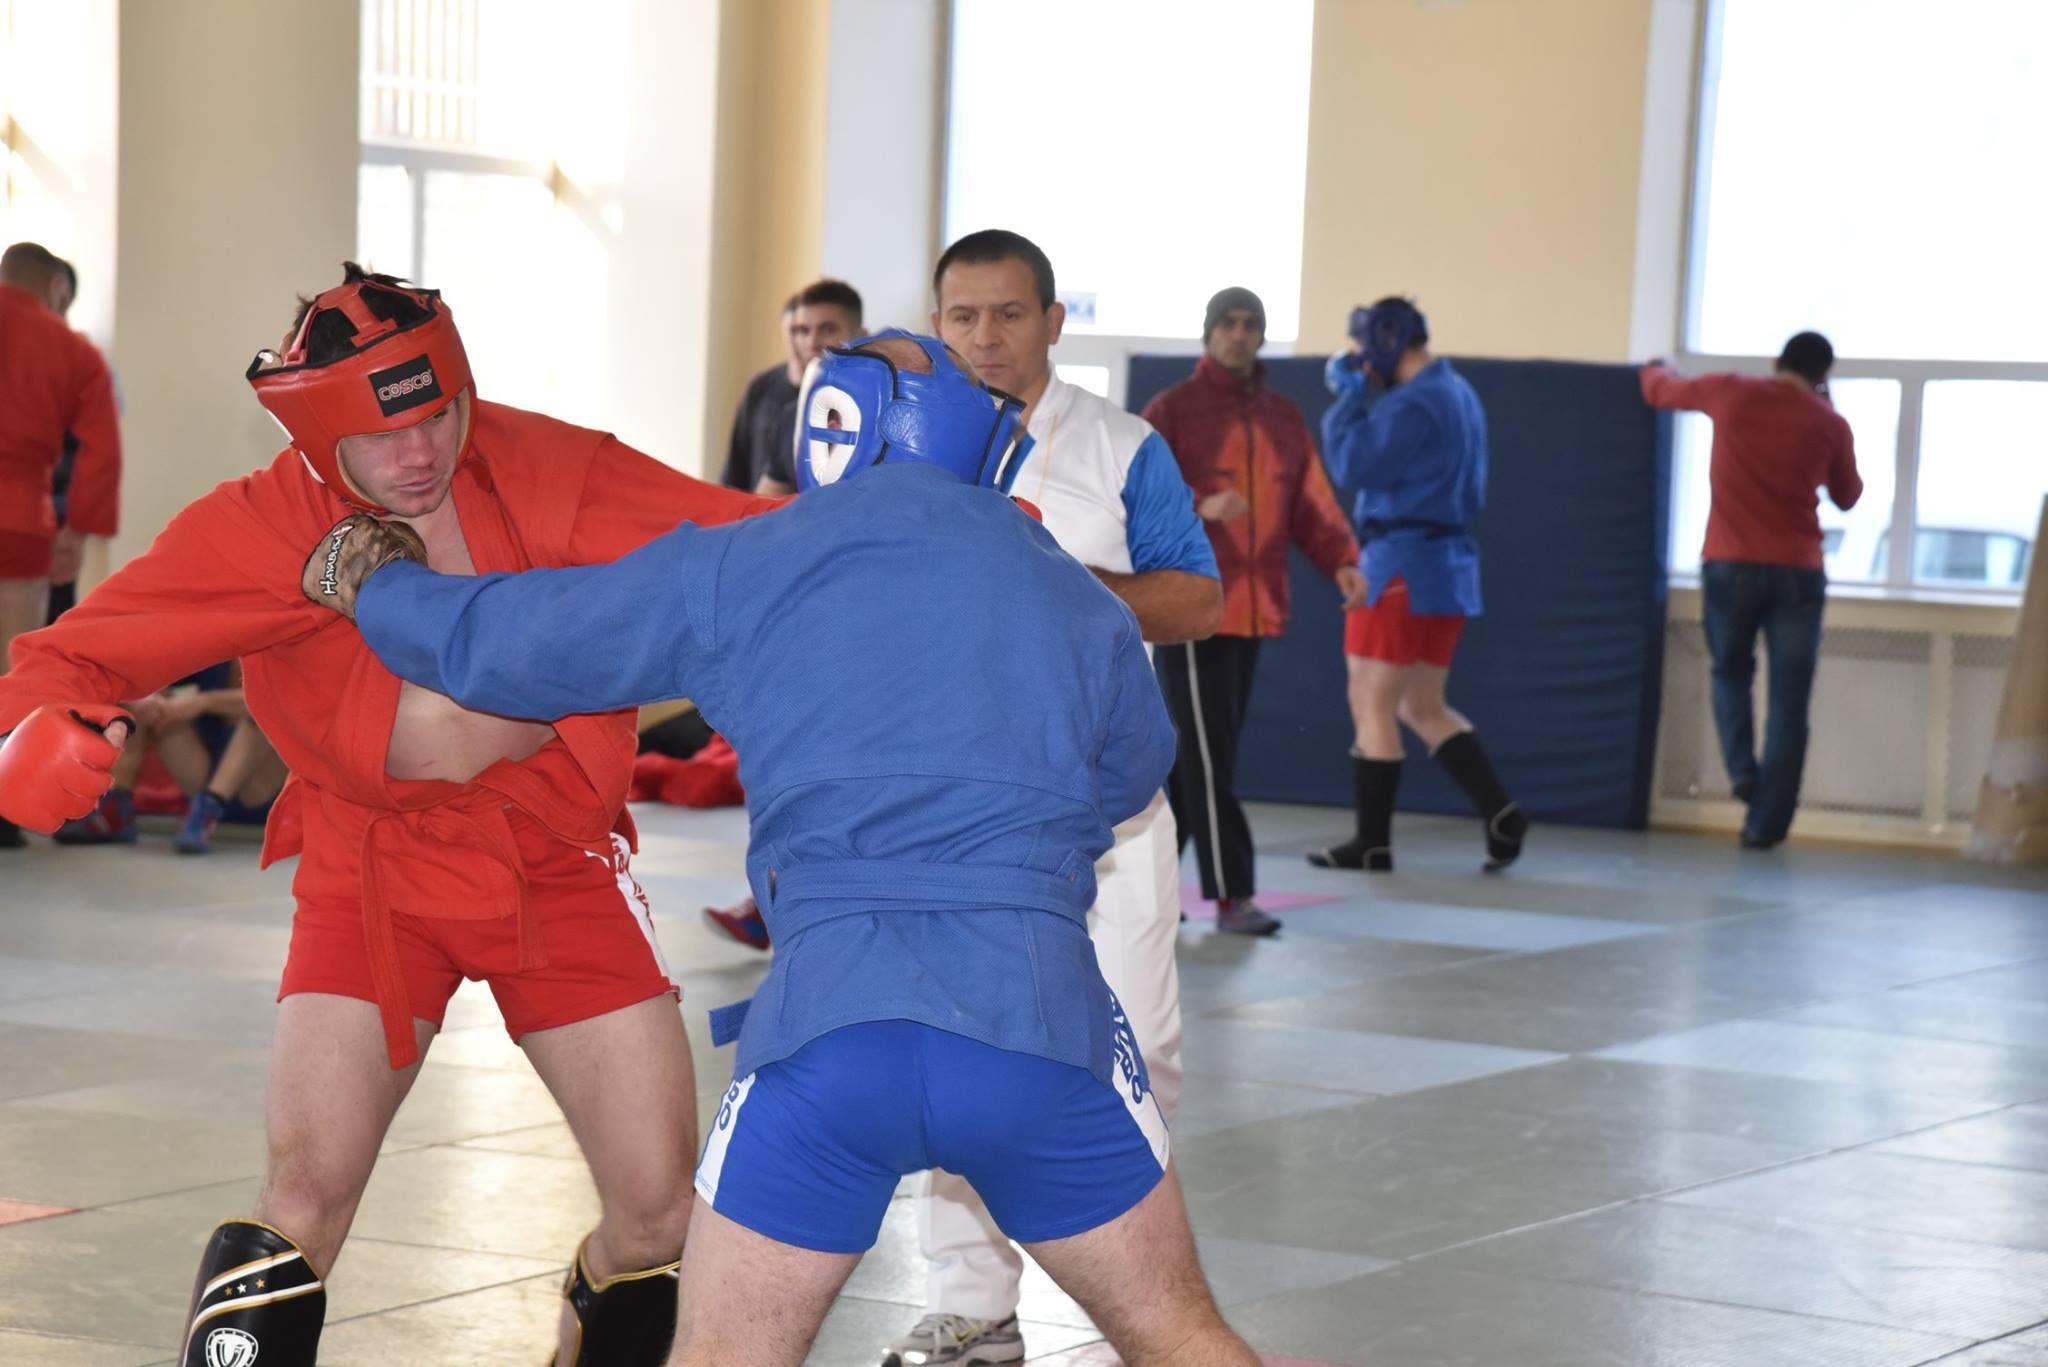 Lupta corp la corp din cadrul Spartachiadei CSC Dinamo 201838